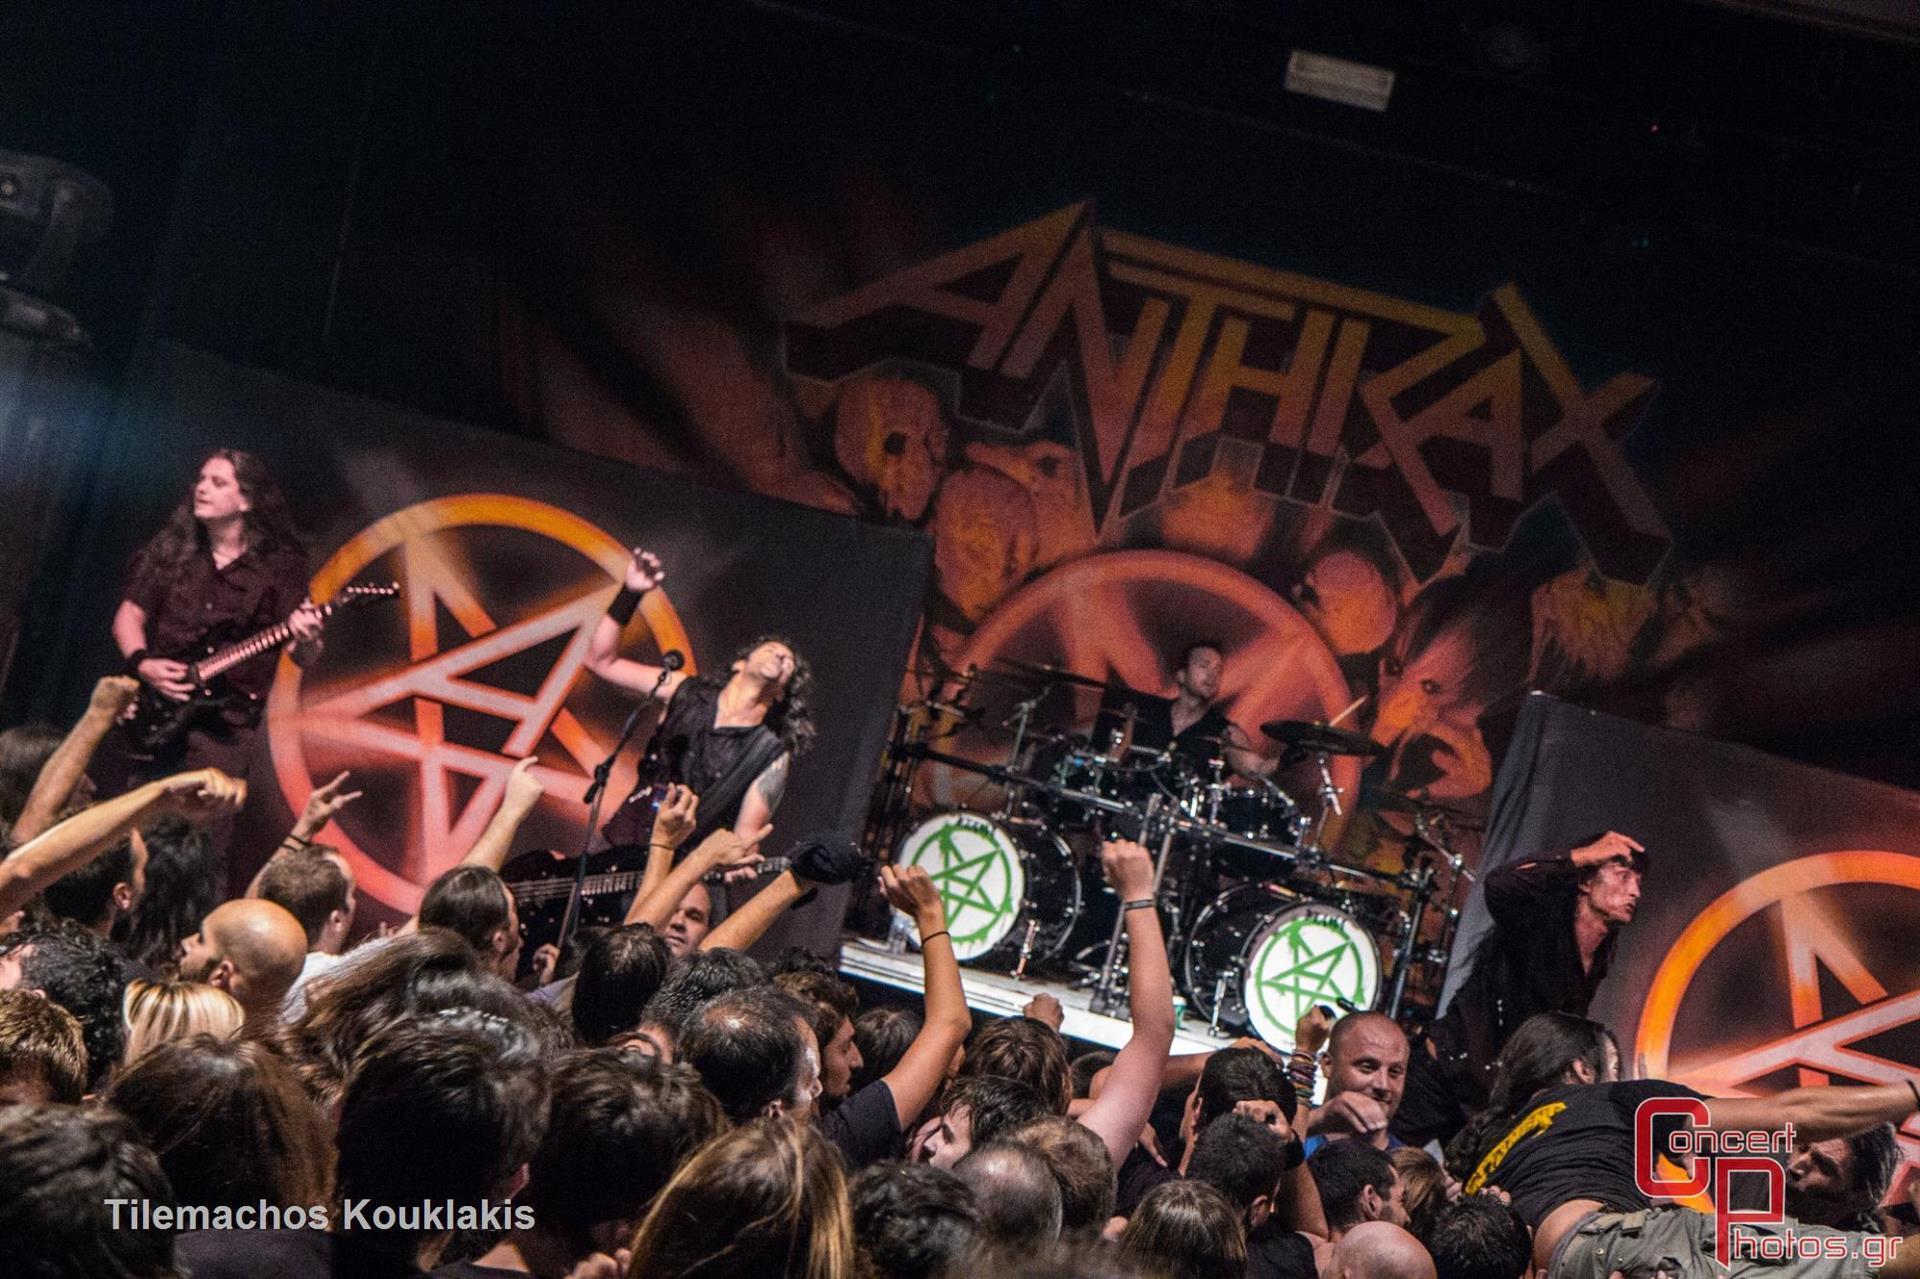 Anthrax-Anthrax photographer: Tilemachos Kouklakis - IMG_2305